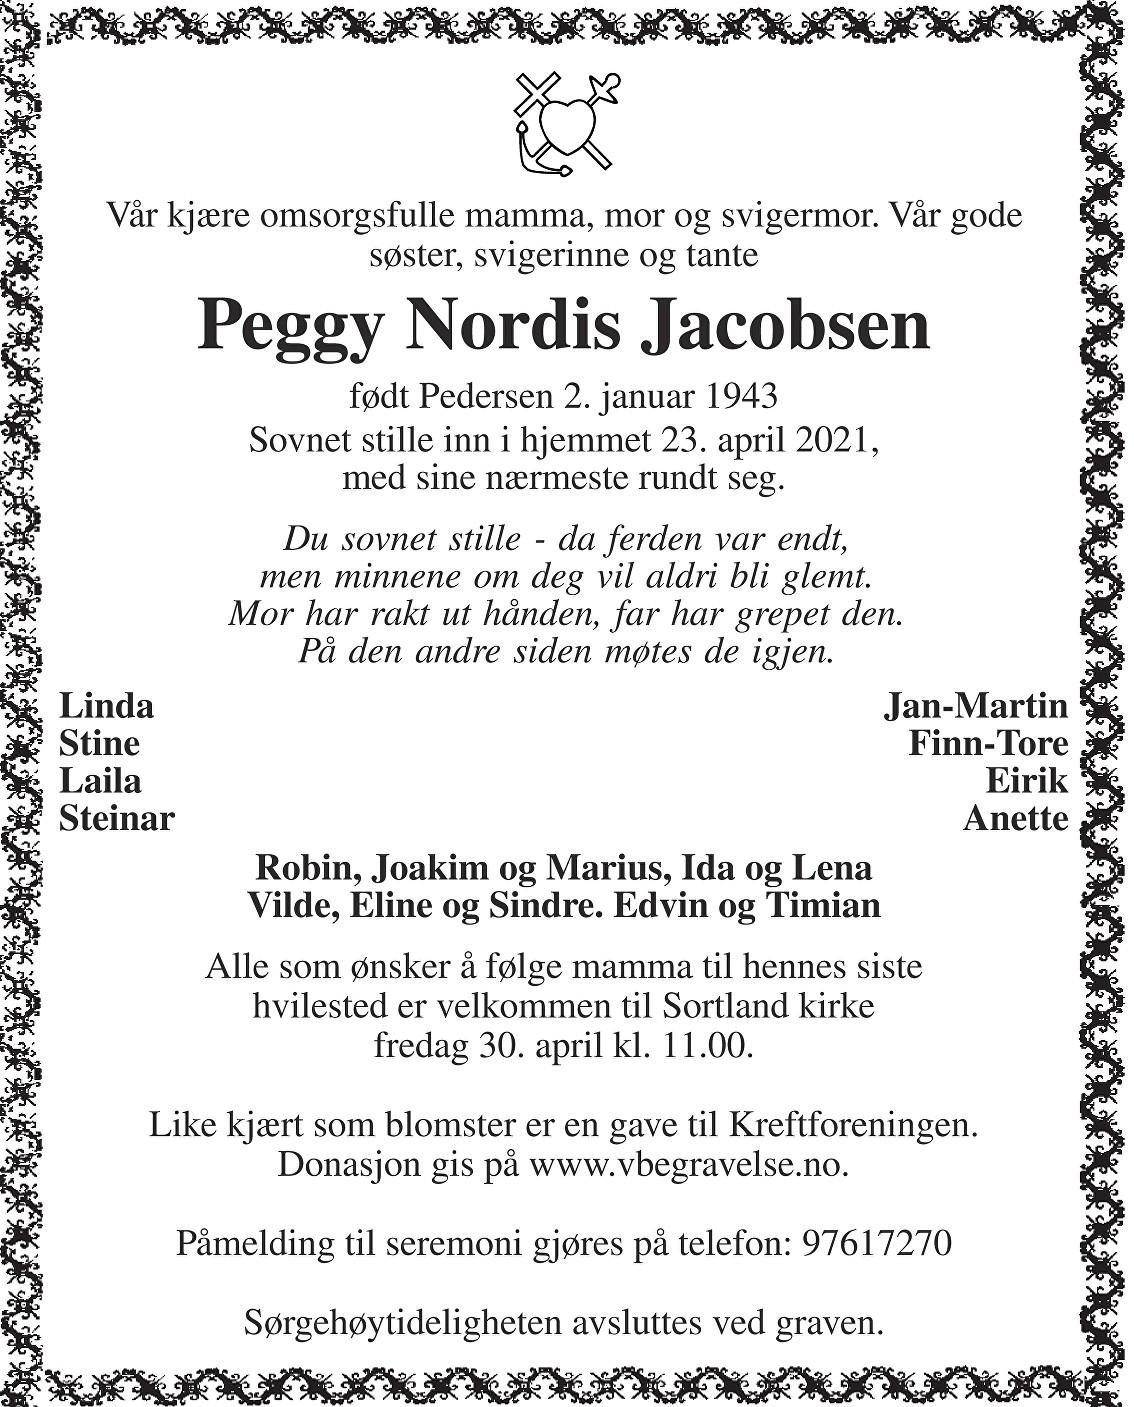 Peggy Nordis Jacobsen Dødsannonse